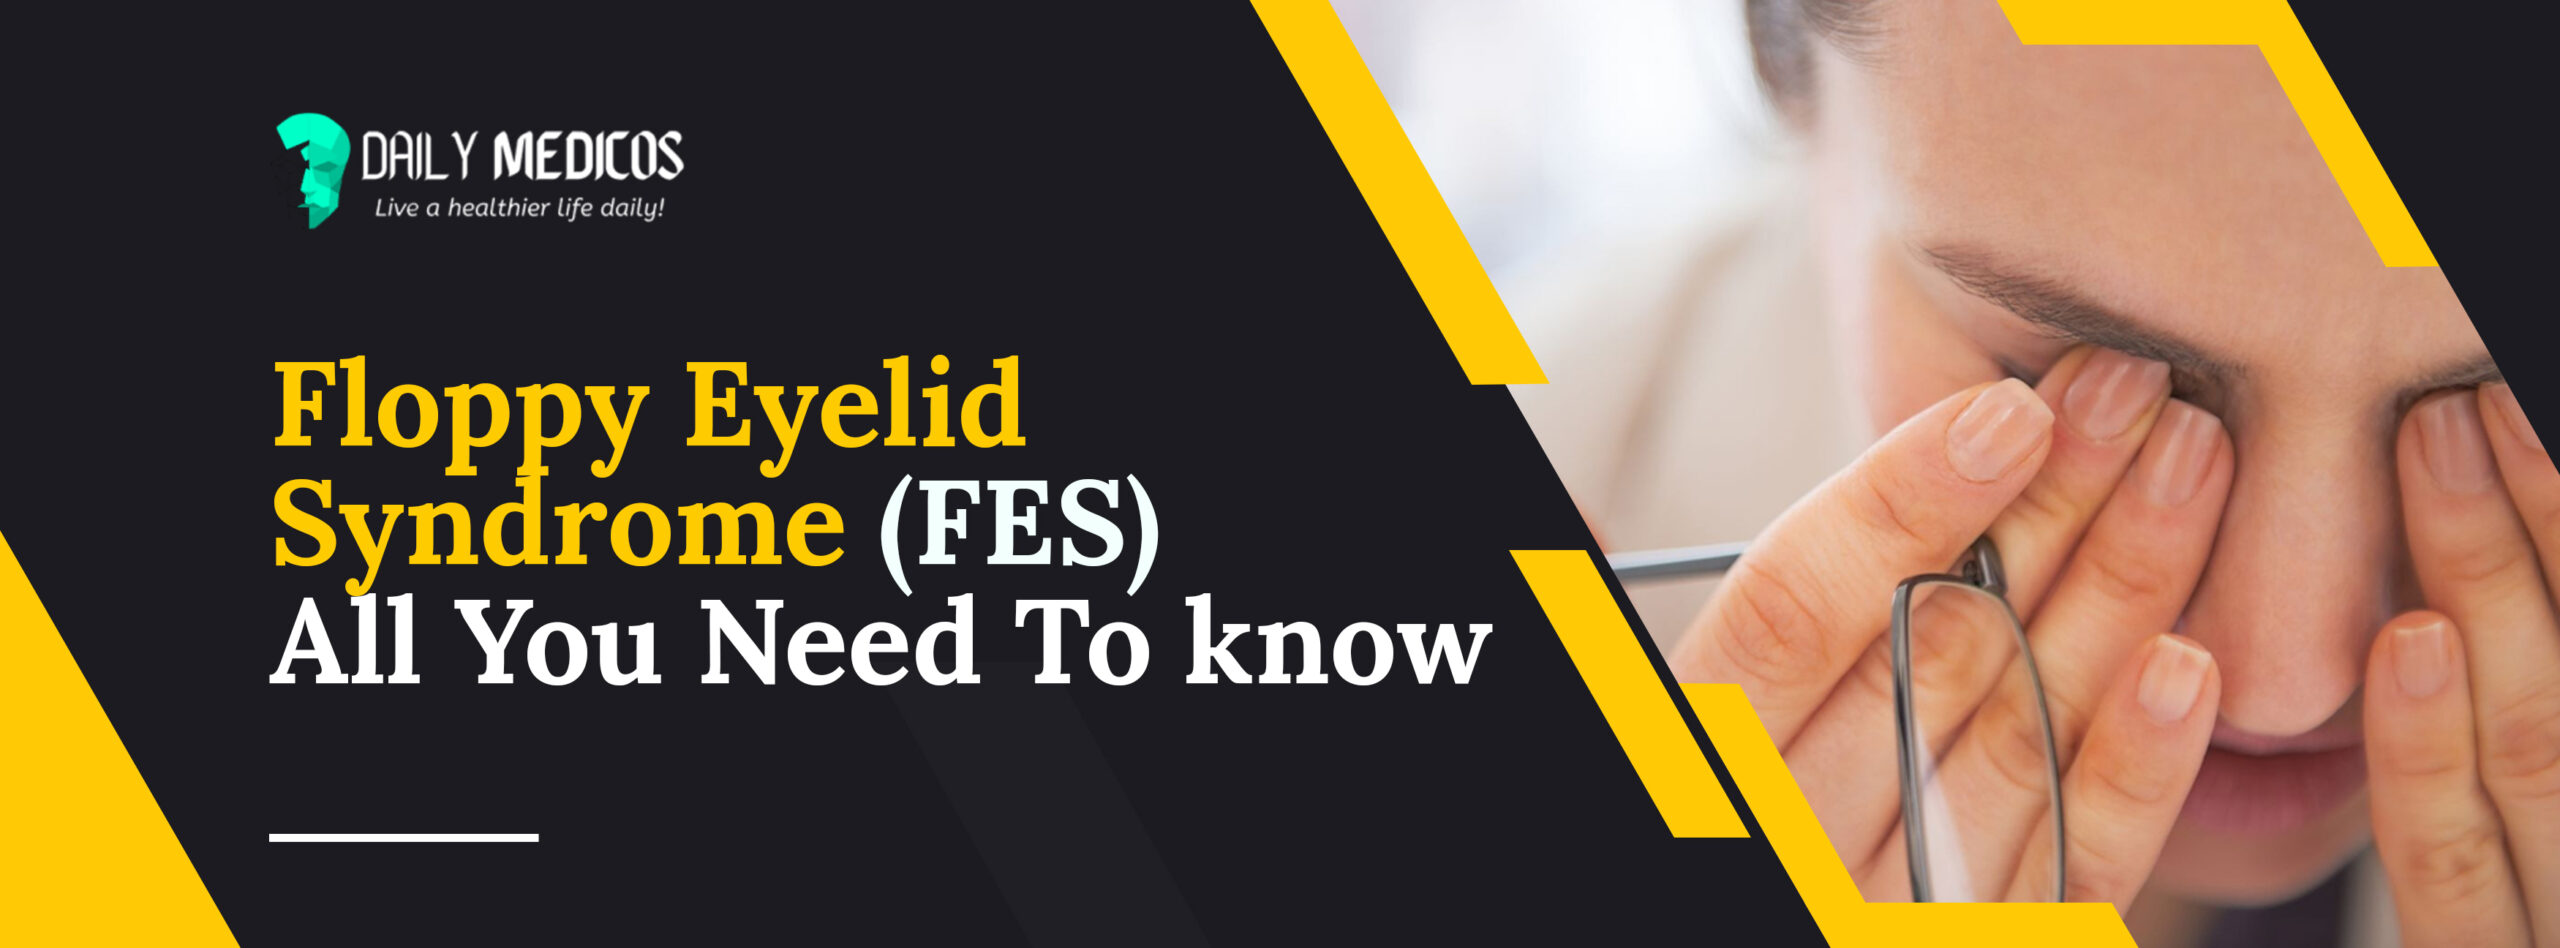 Floppy Eyelid Syndrome (FES): Causes, Symptoms, & Treatment 59 - Daily Medicos